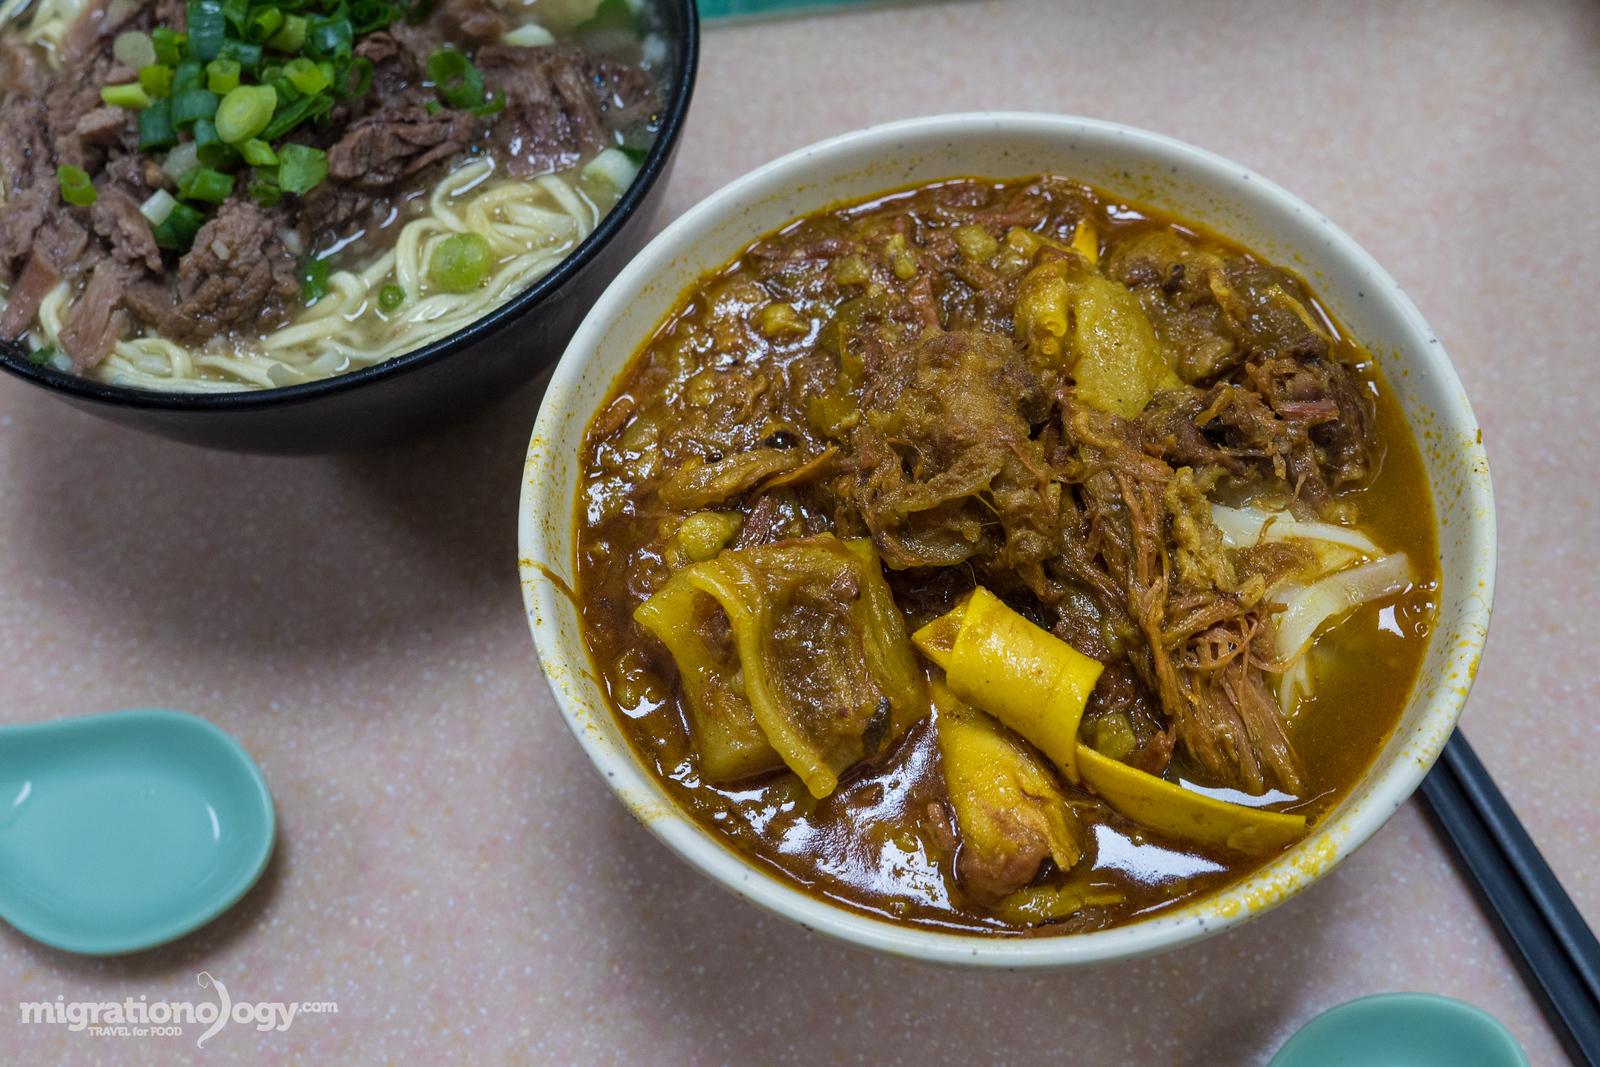 Kau Kee Restaurant (九記牛腩)